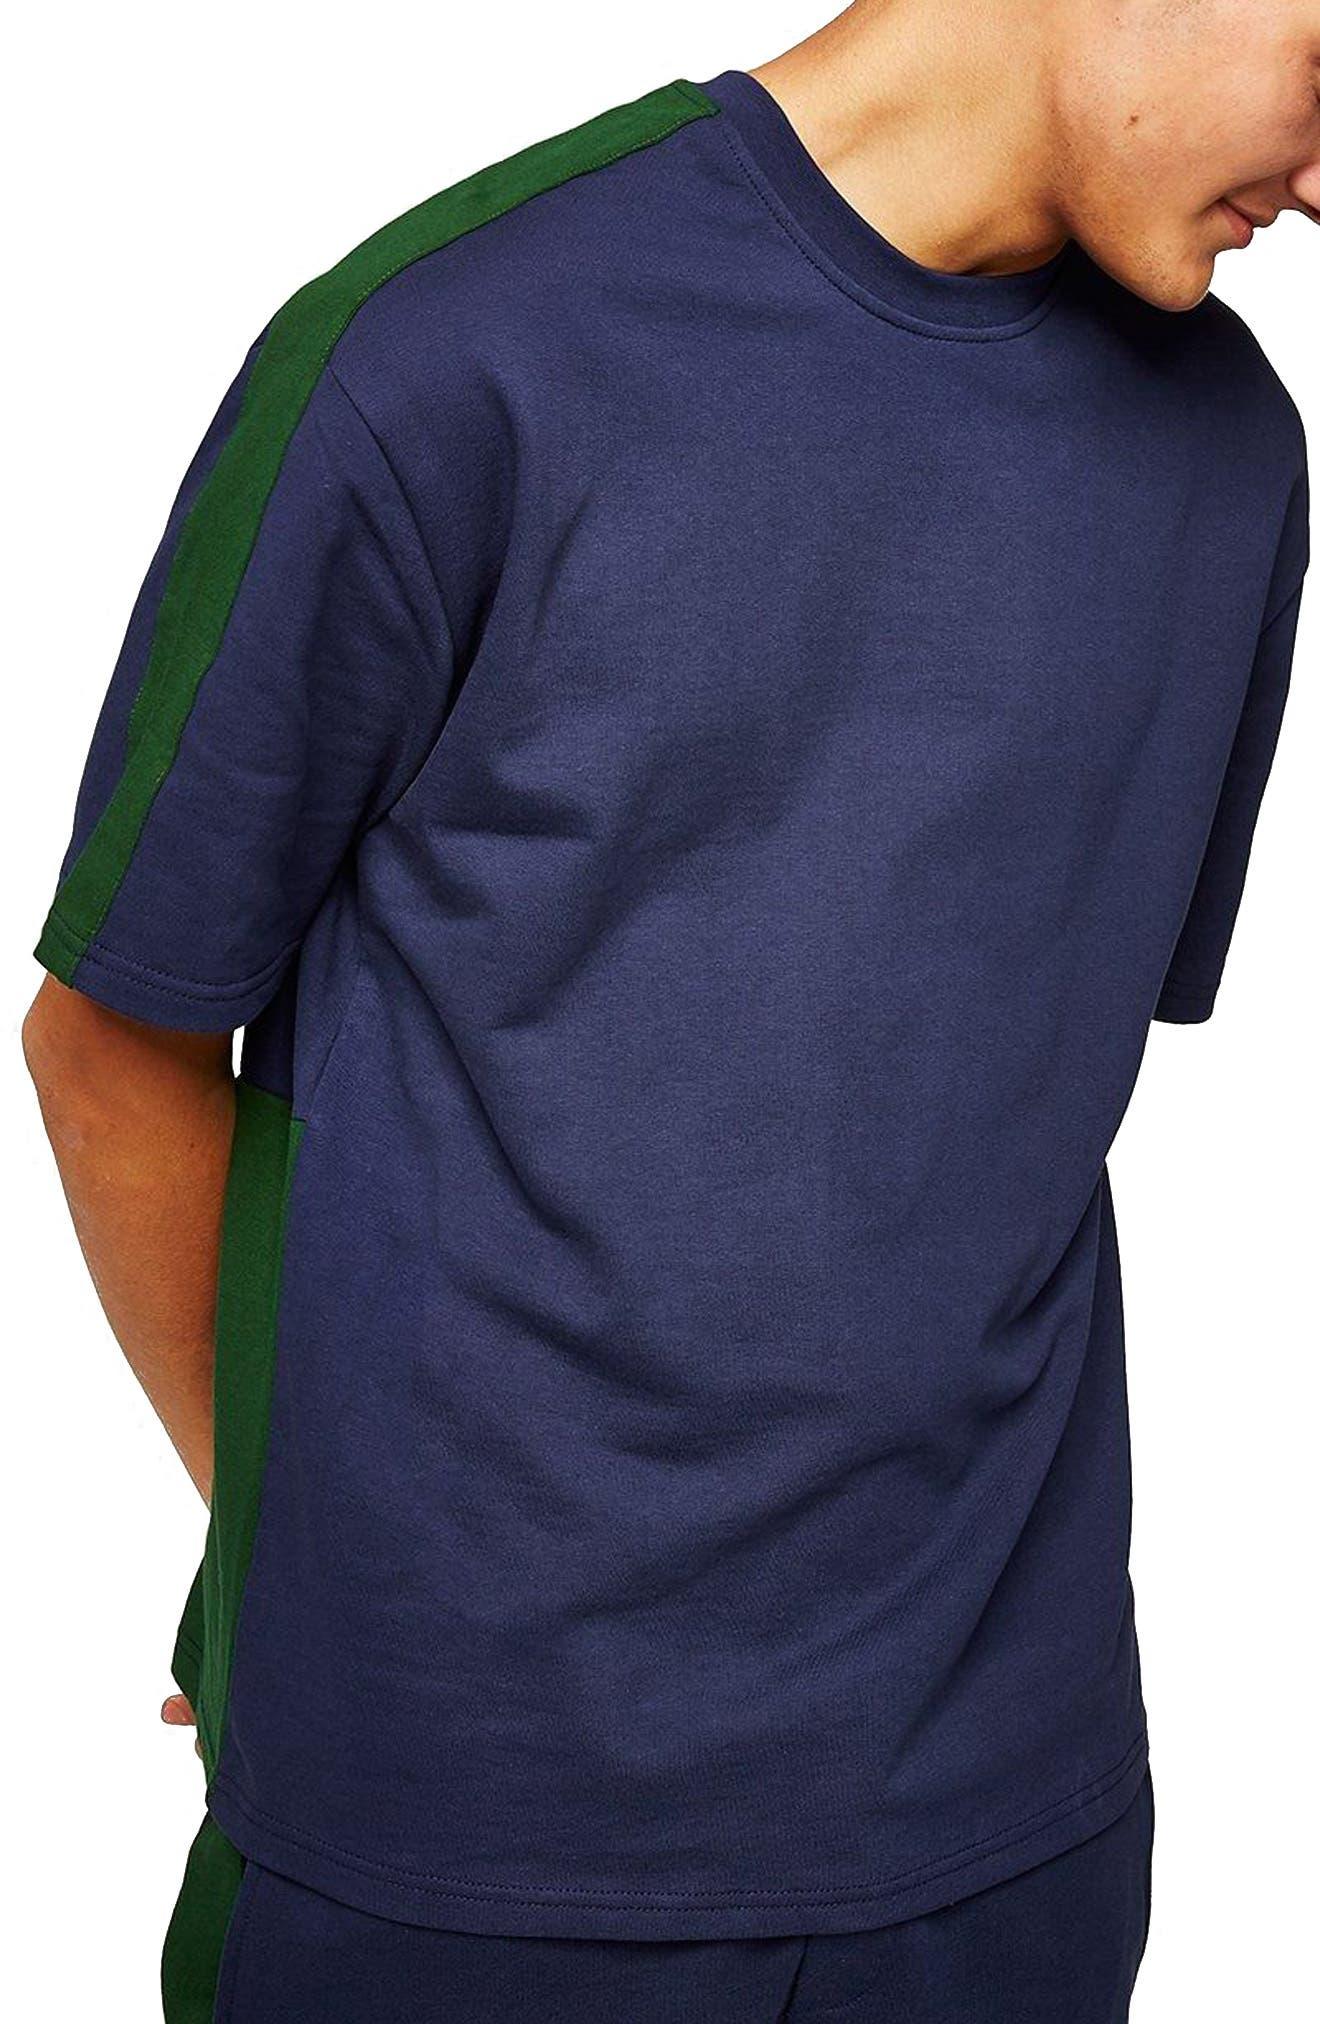 Colorblock Short Sleeve Sweatshirt,                             Main thumbnail 1, color,                             400